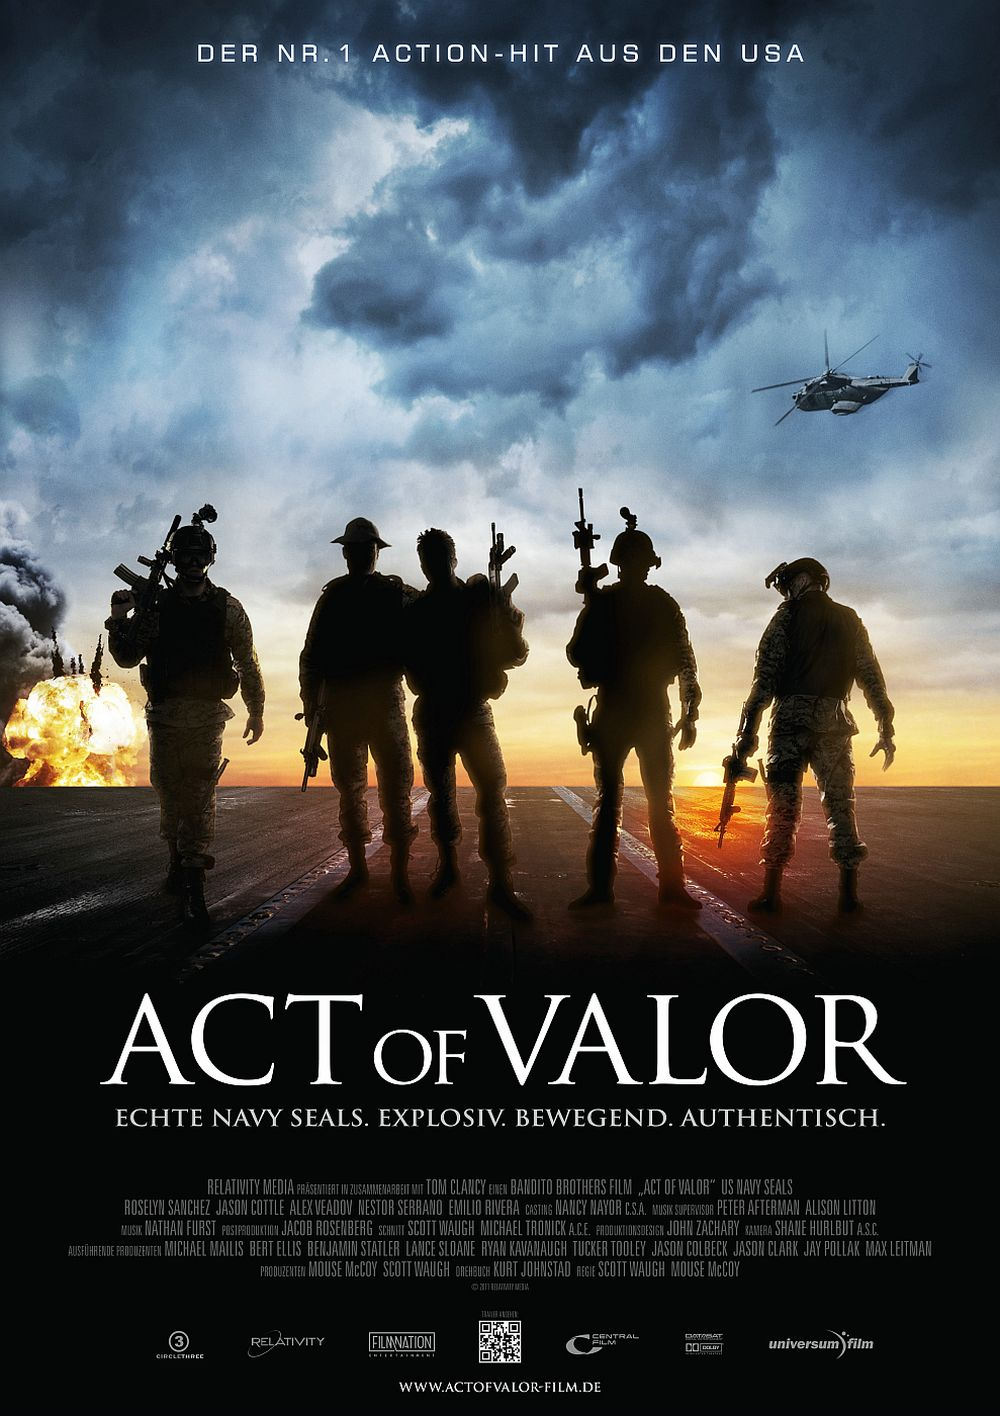 Act of Valor (Kino) 2012